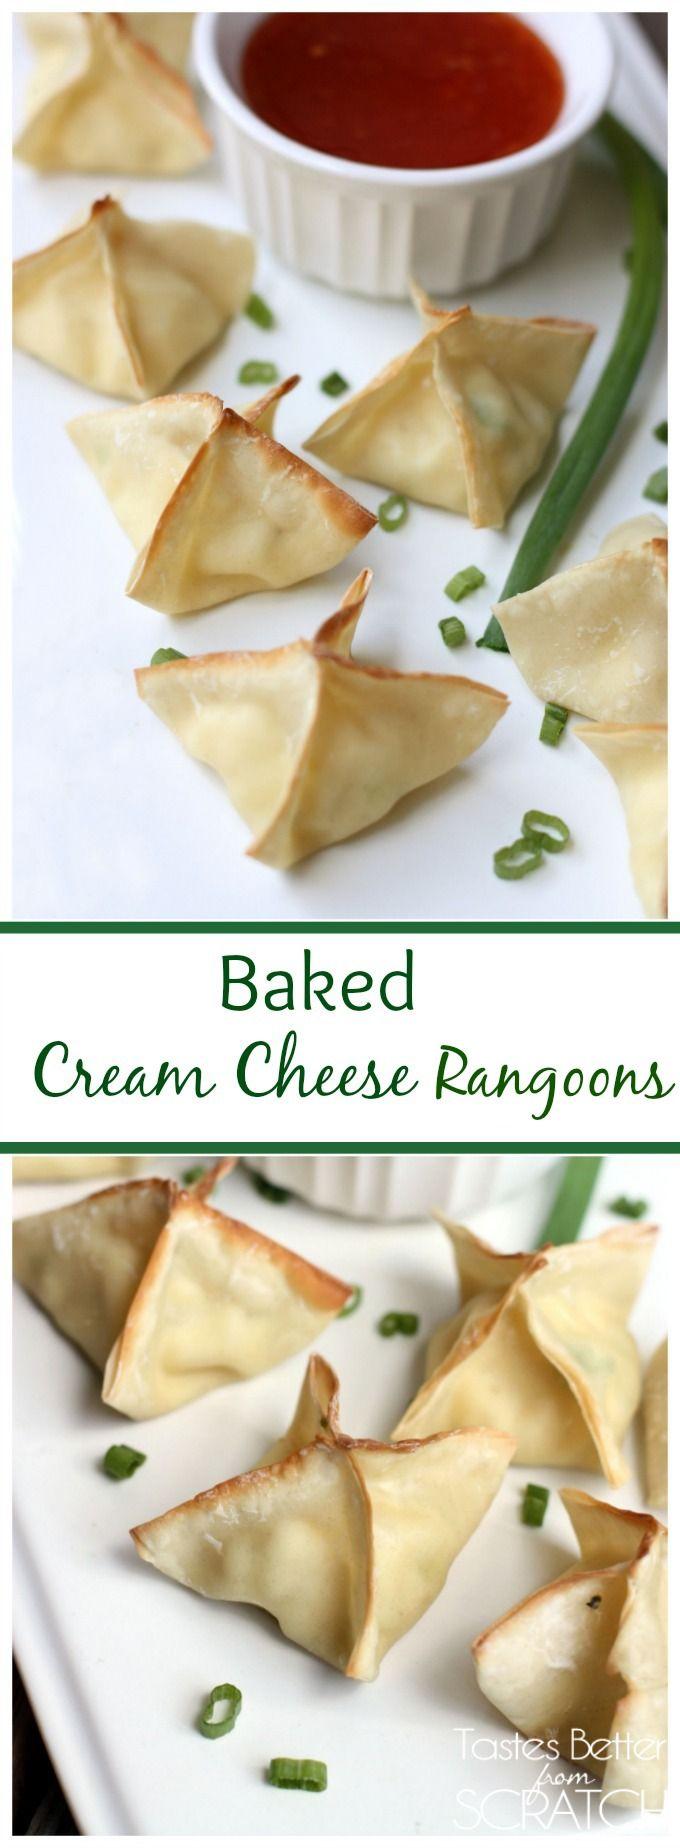 Baked Cream Cheese Rangoons are SO easy and taste amazing! Recipe on TastesBetterFromScratch.com #rangoons #creamcheese